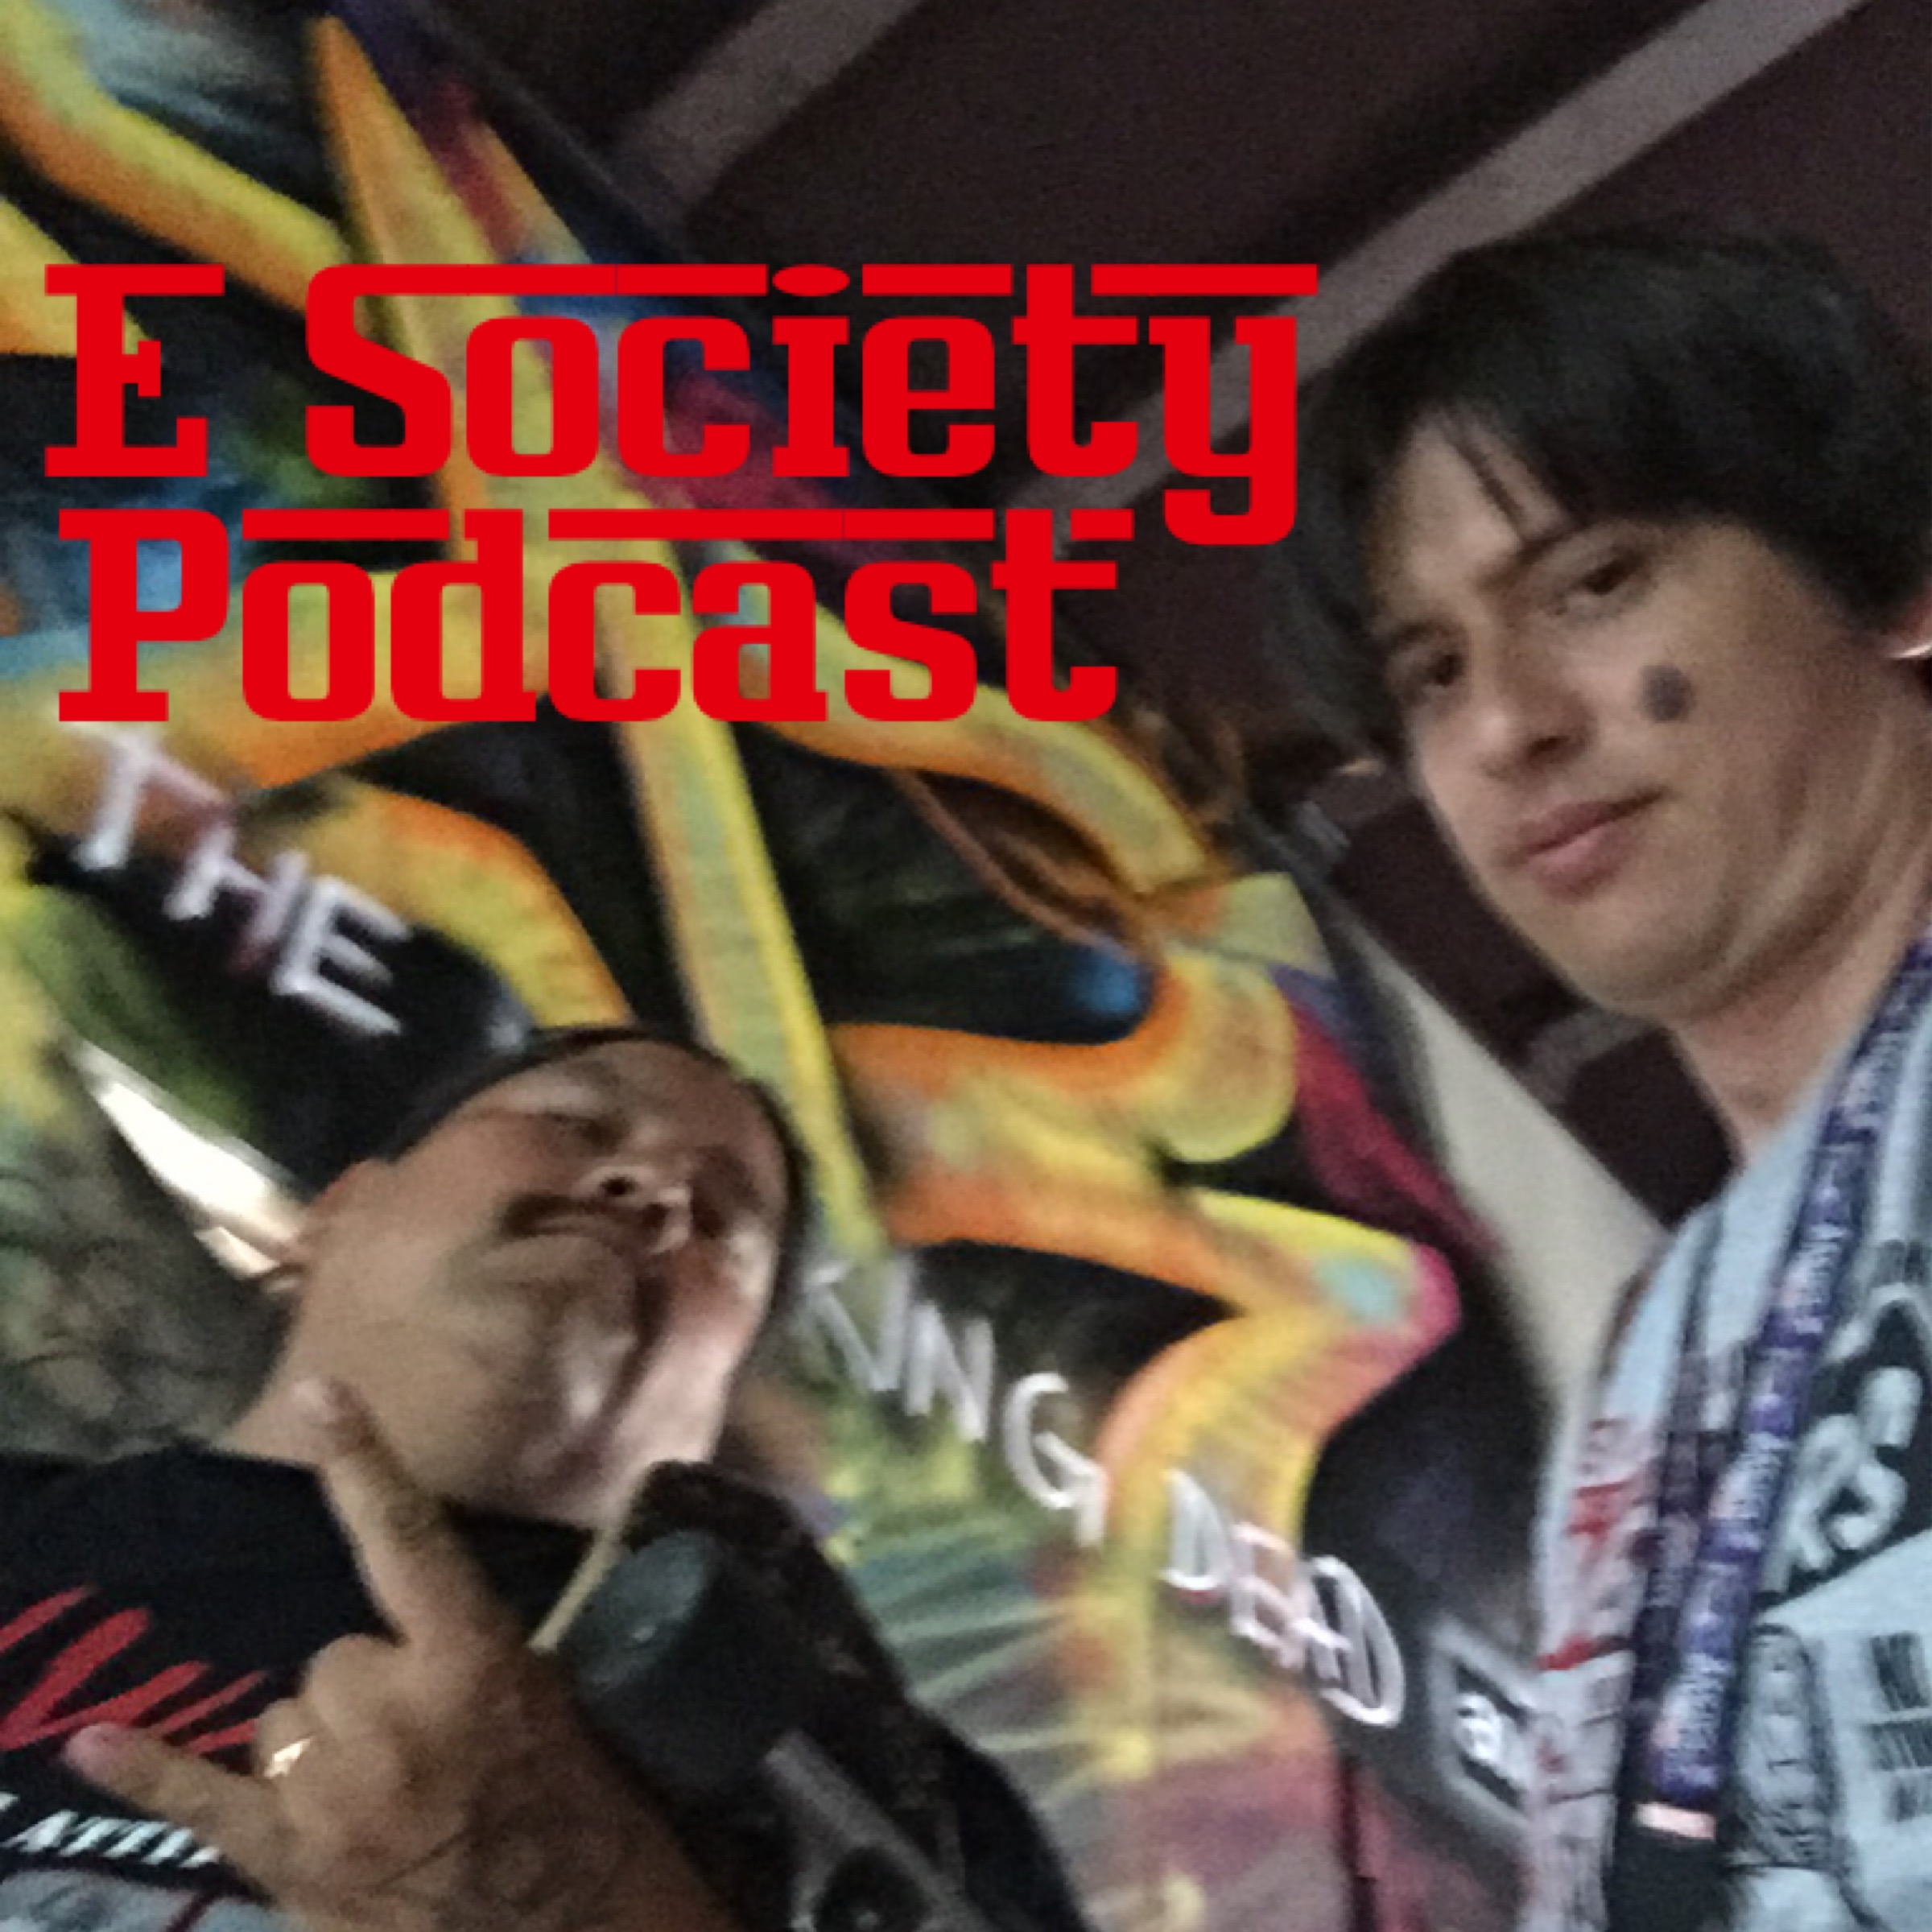 E Society Podcast - Ep. 14: Friendly Neighborhood Podcasters